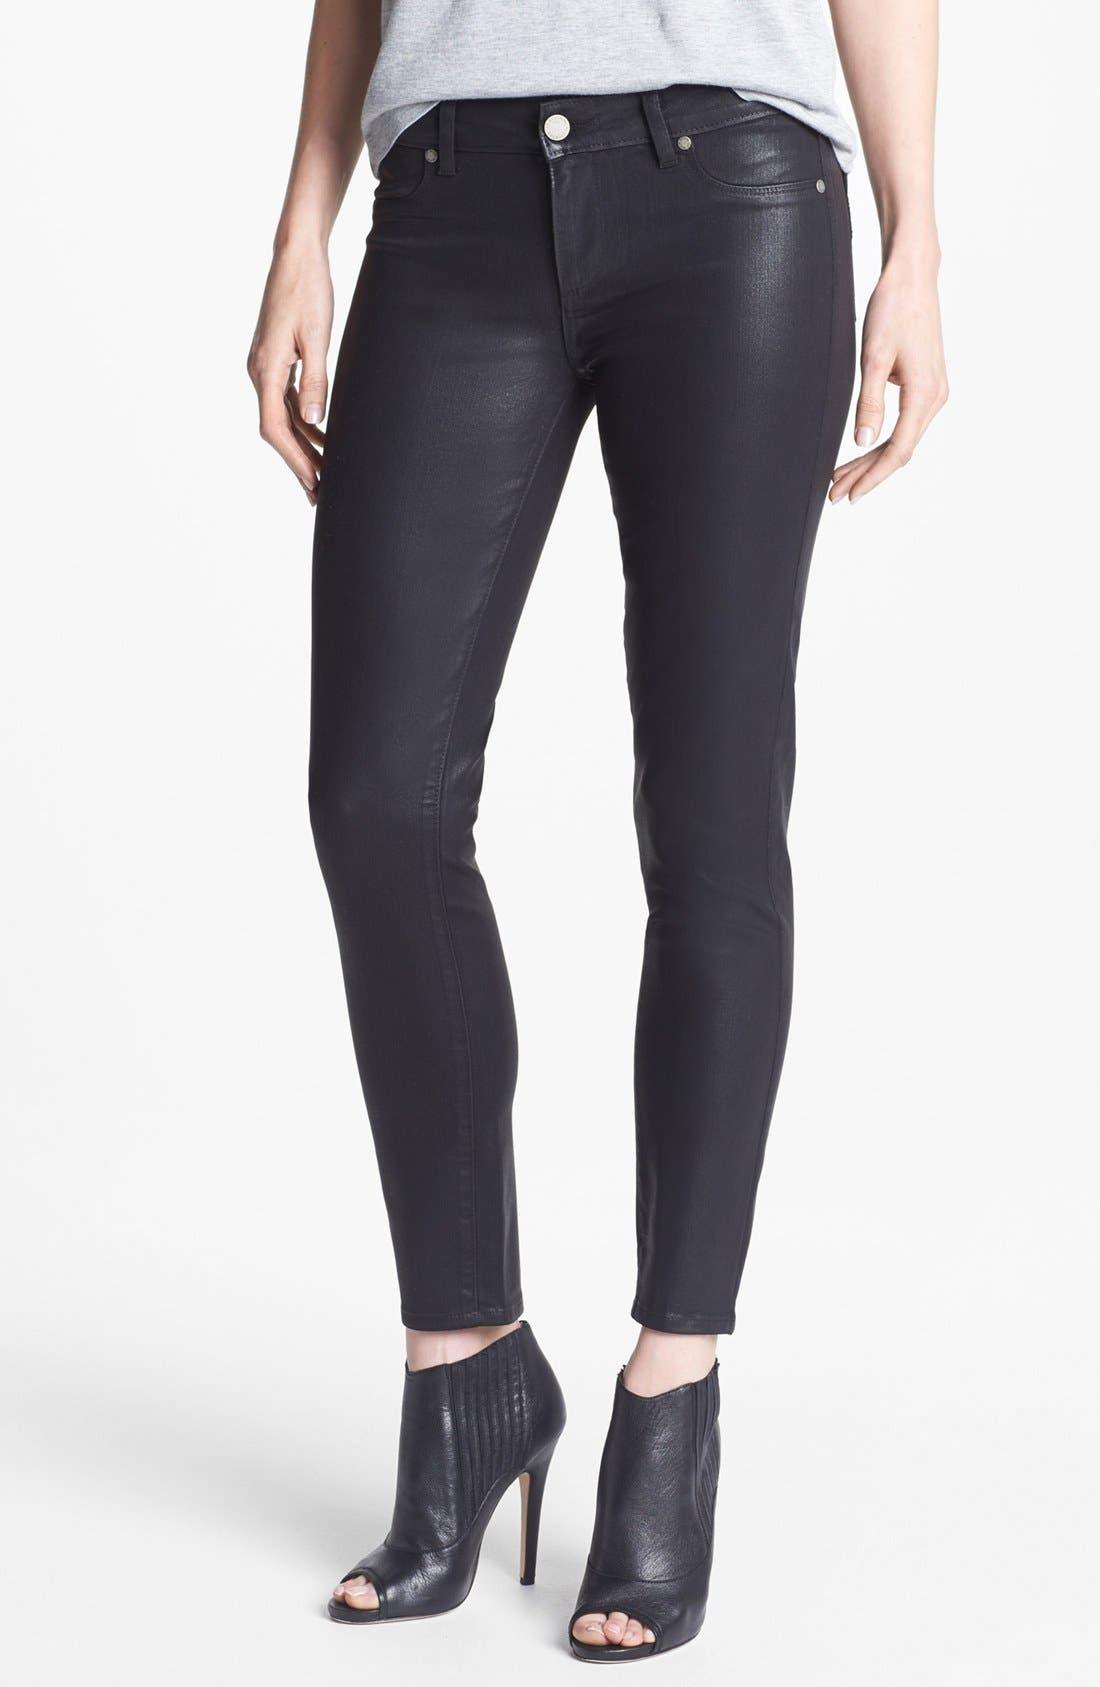 Denim 'Verdugo' Ankle Coated Skinny Jeans, Main, color, 001